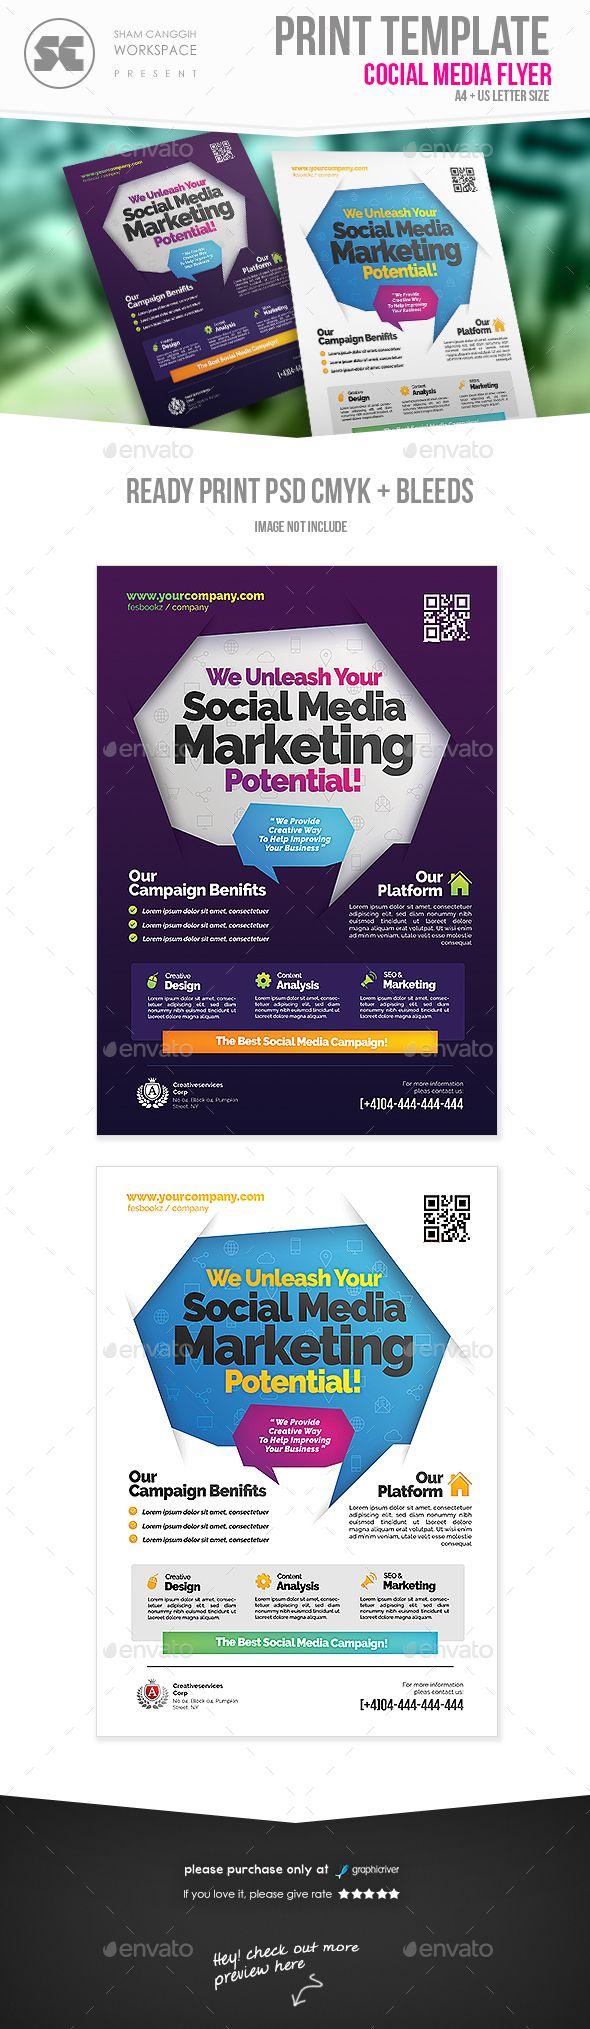 Social Media Campaign Flyer Flyer Template Social Media Template